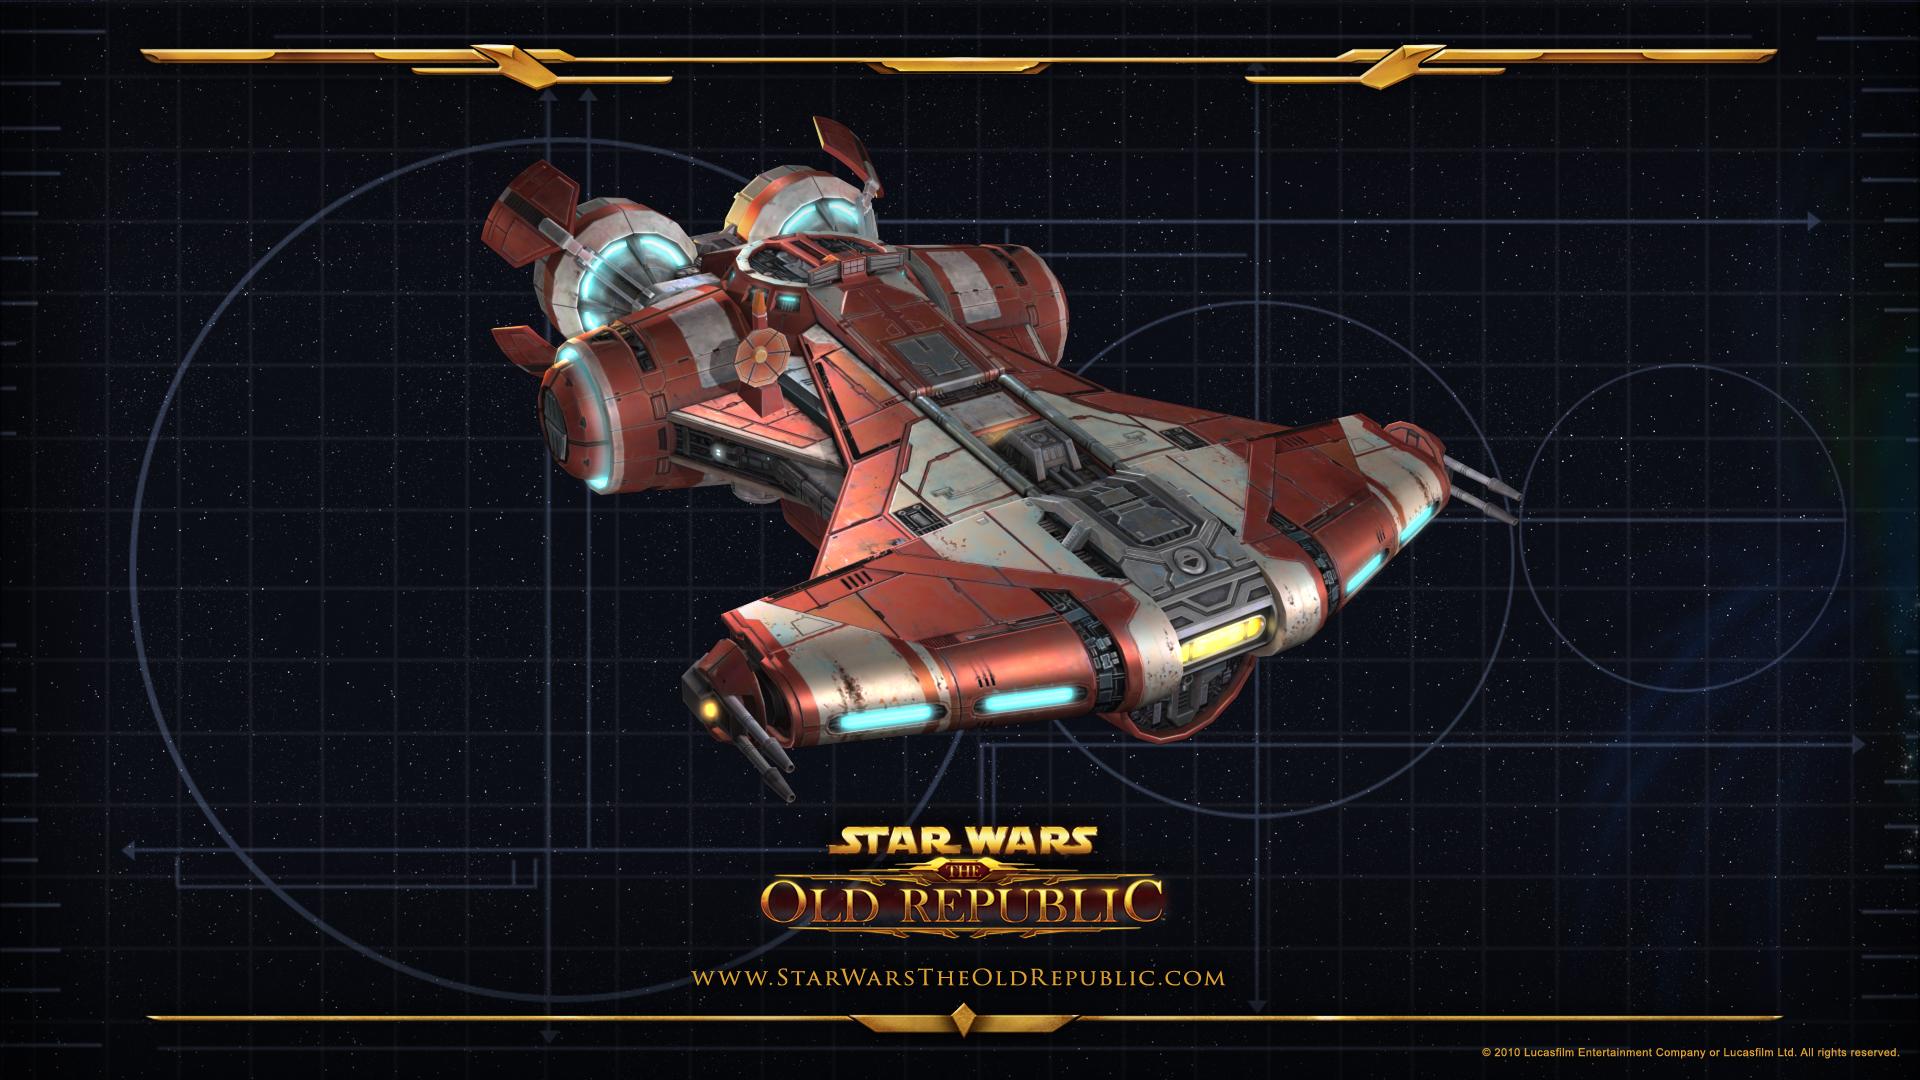 Star Wars the Old Republic wallpaper 17